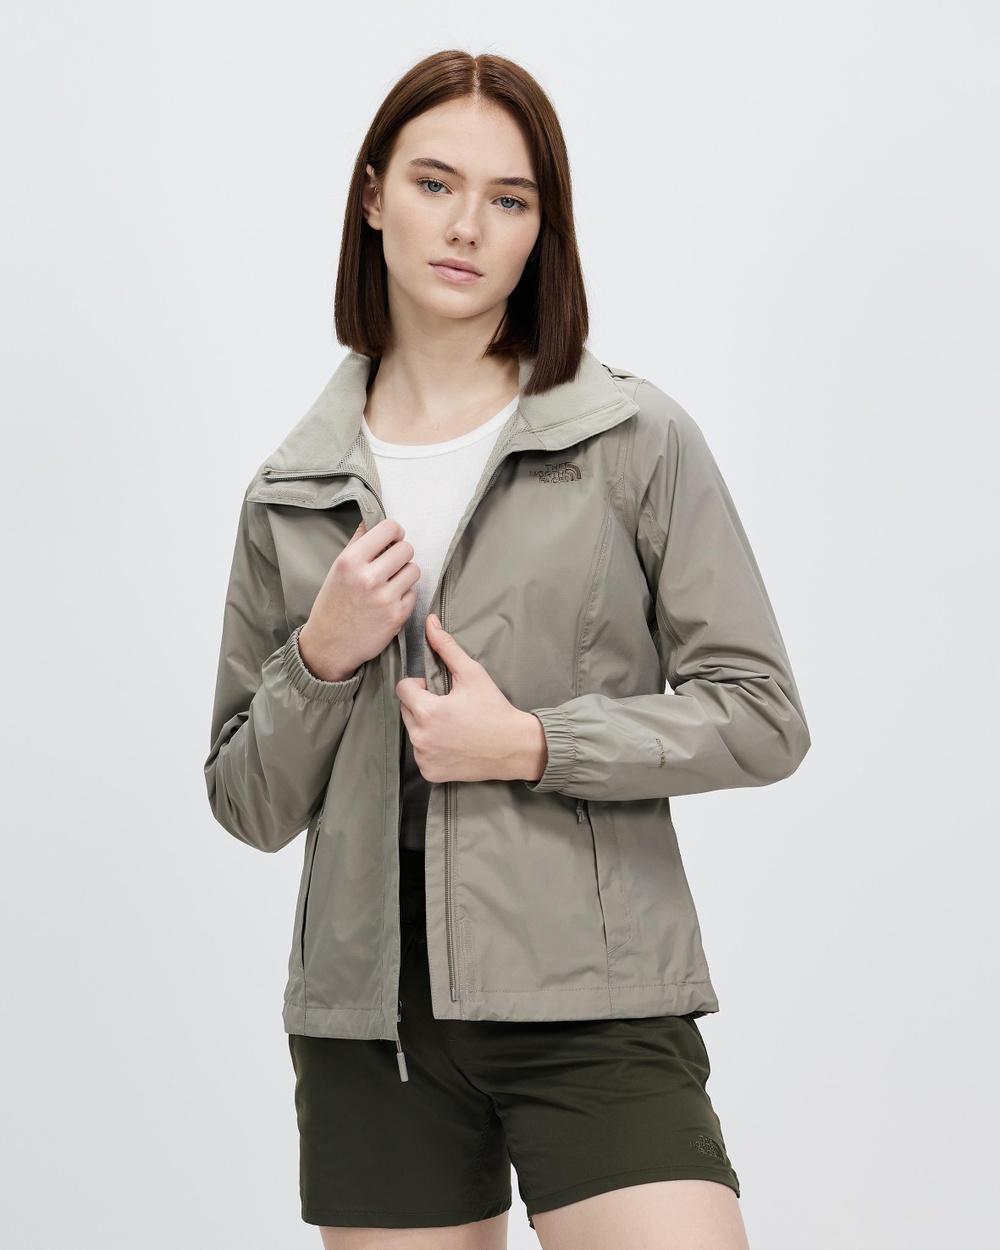 The North Face Resolve 2 Jacket Coats & Jackets Mineral Grey